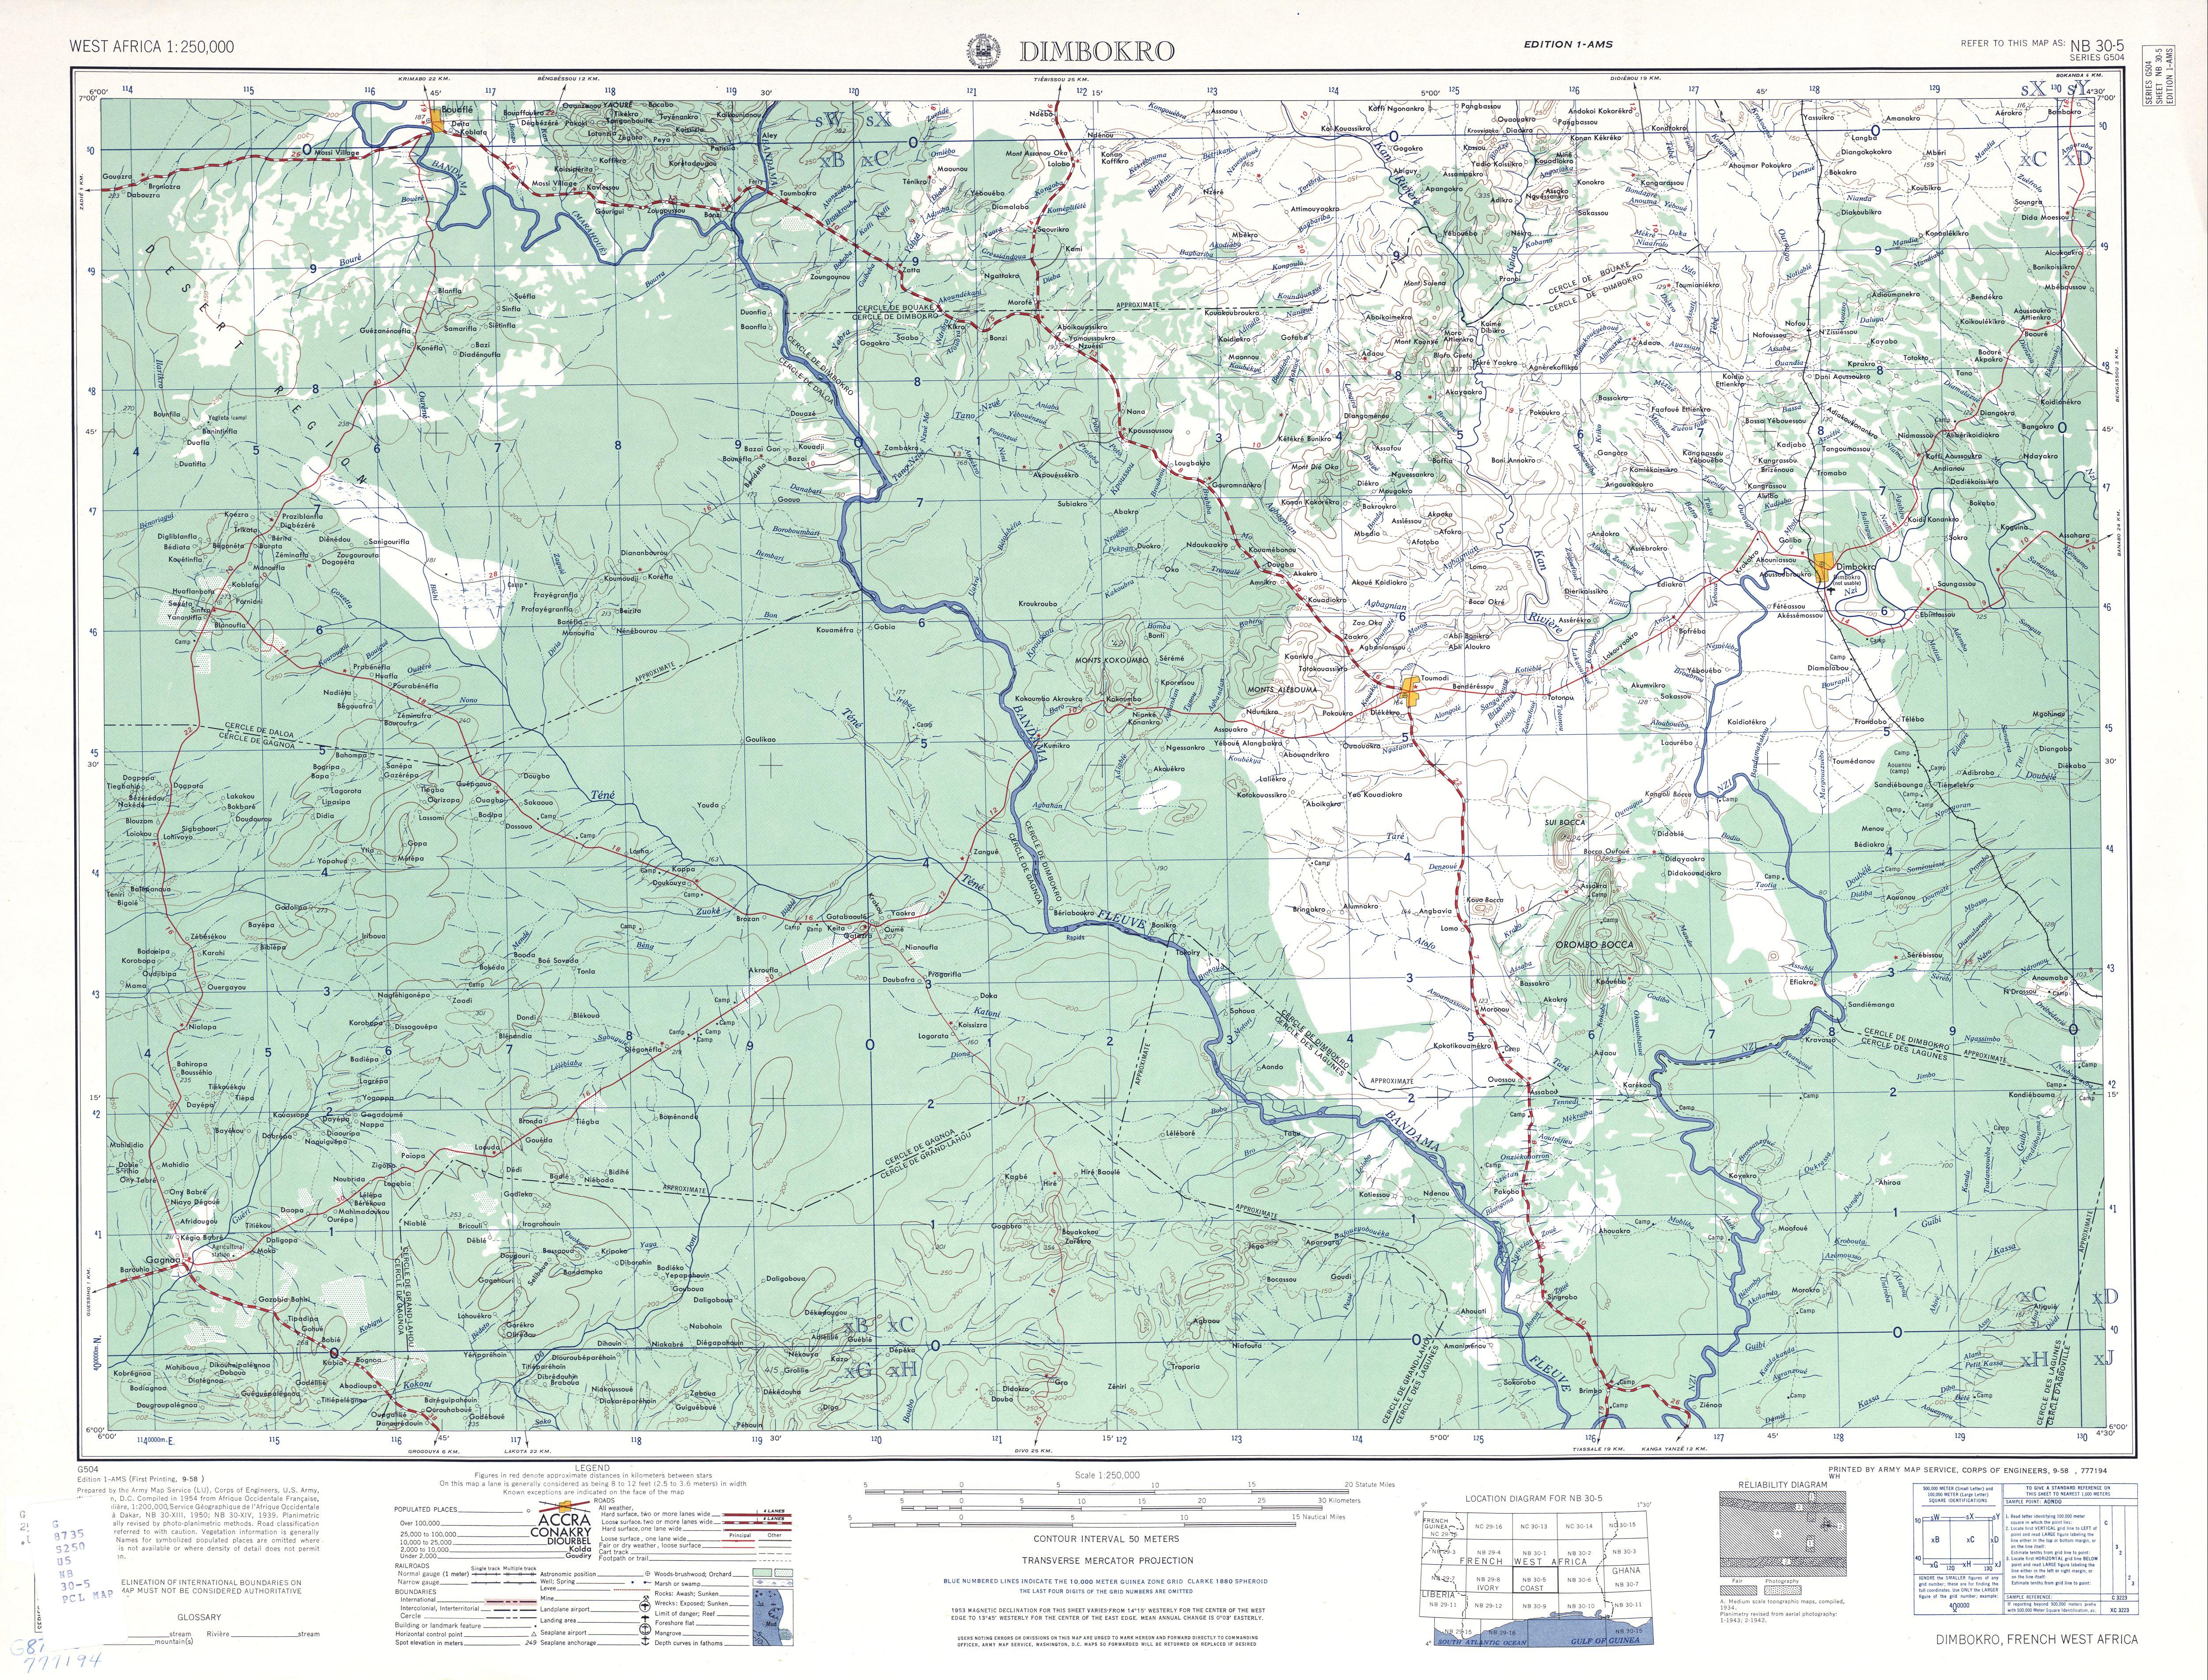 Hoja Dimbokro del Mapa Topográfico de África Occidental 1955